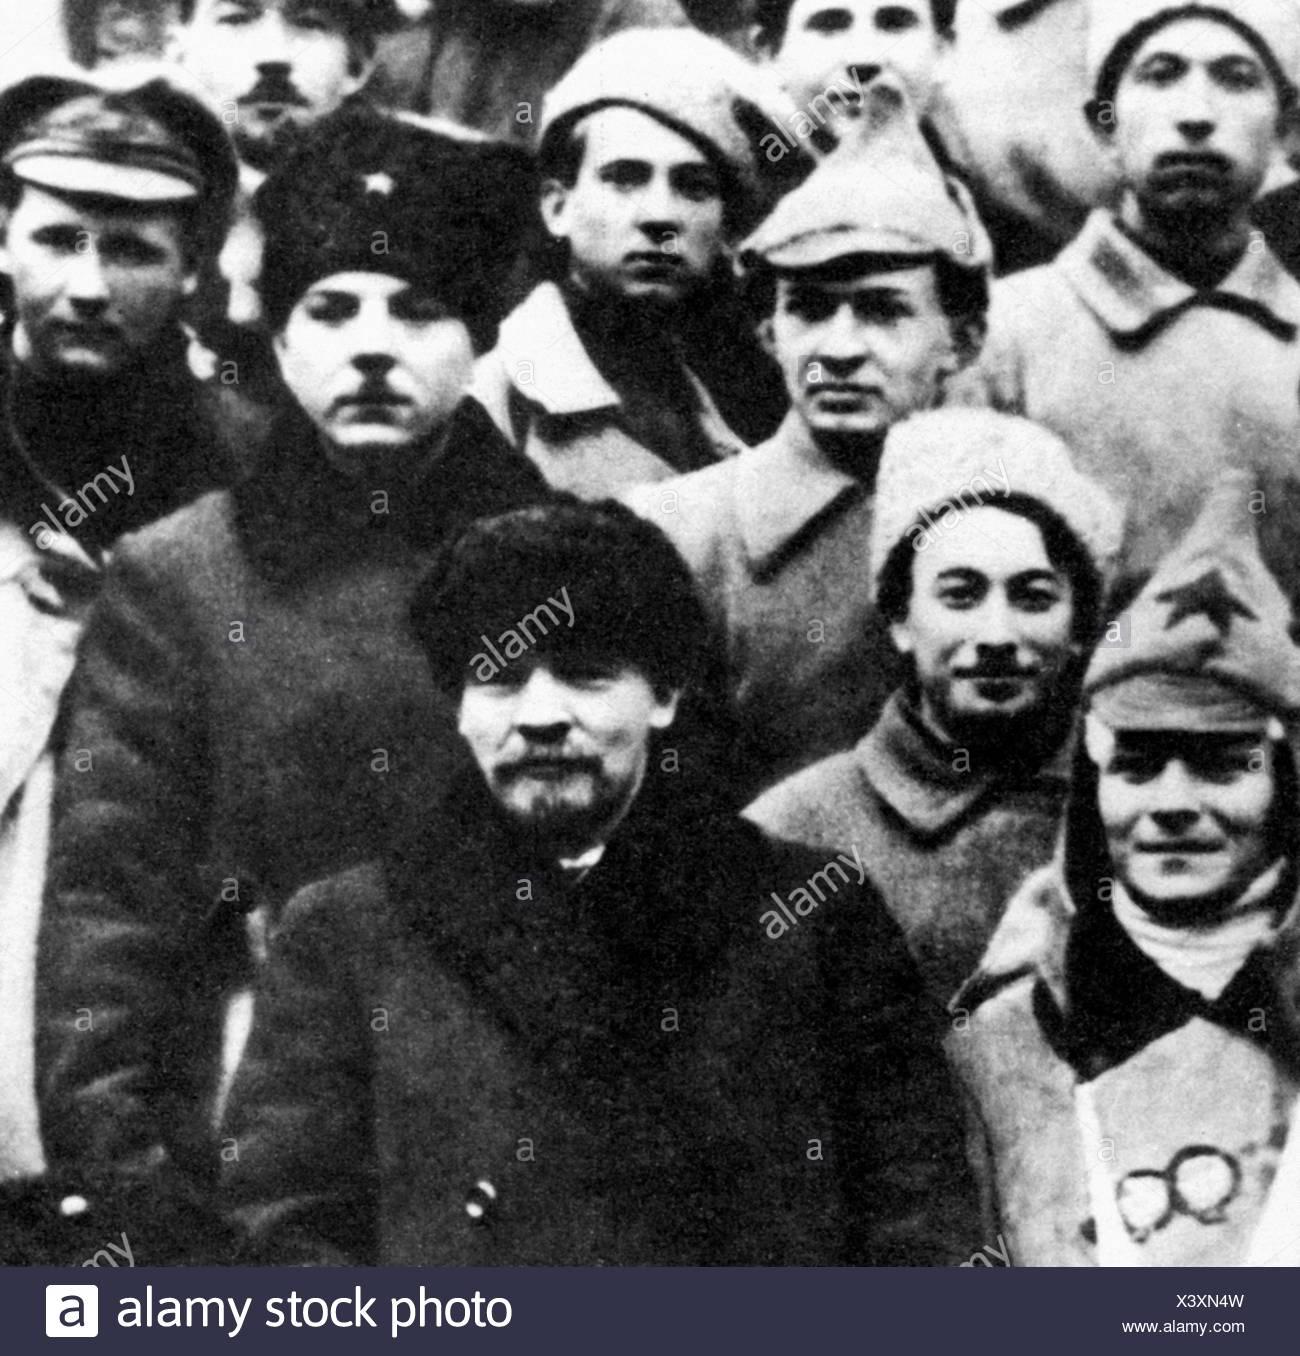 Lenin (Vladimir Ilyich Ulyanov), 22.4.1870 - 21.1.1924, Russian politician, half length, with Kliment Voroshilov and delegates of the X party congress of the CPSU, 1921, Stock Photo